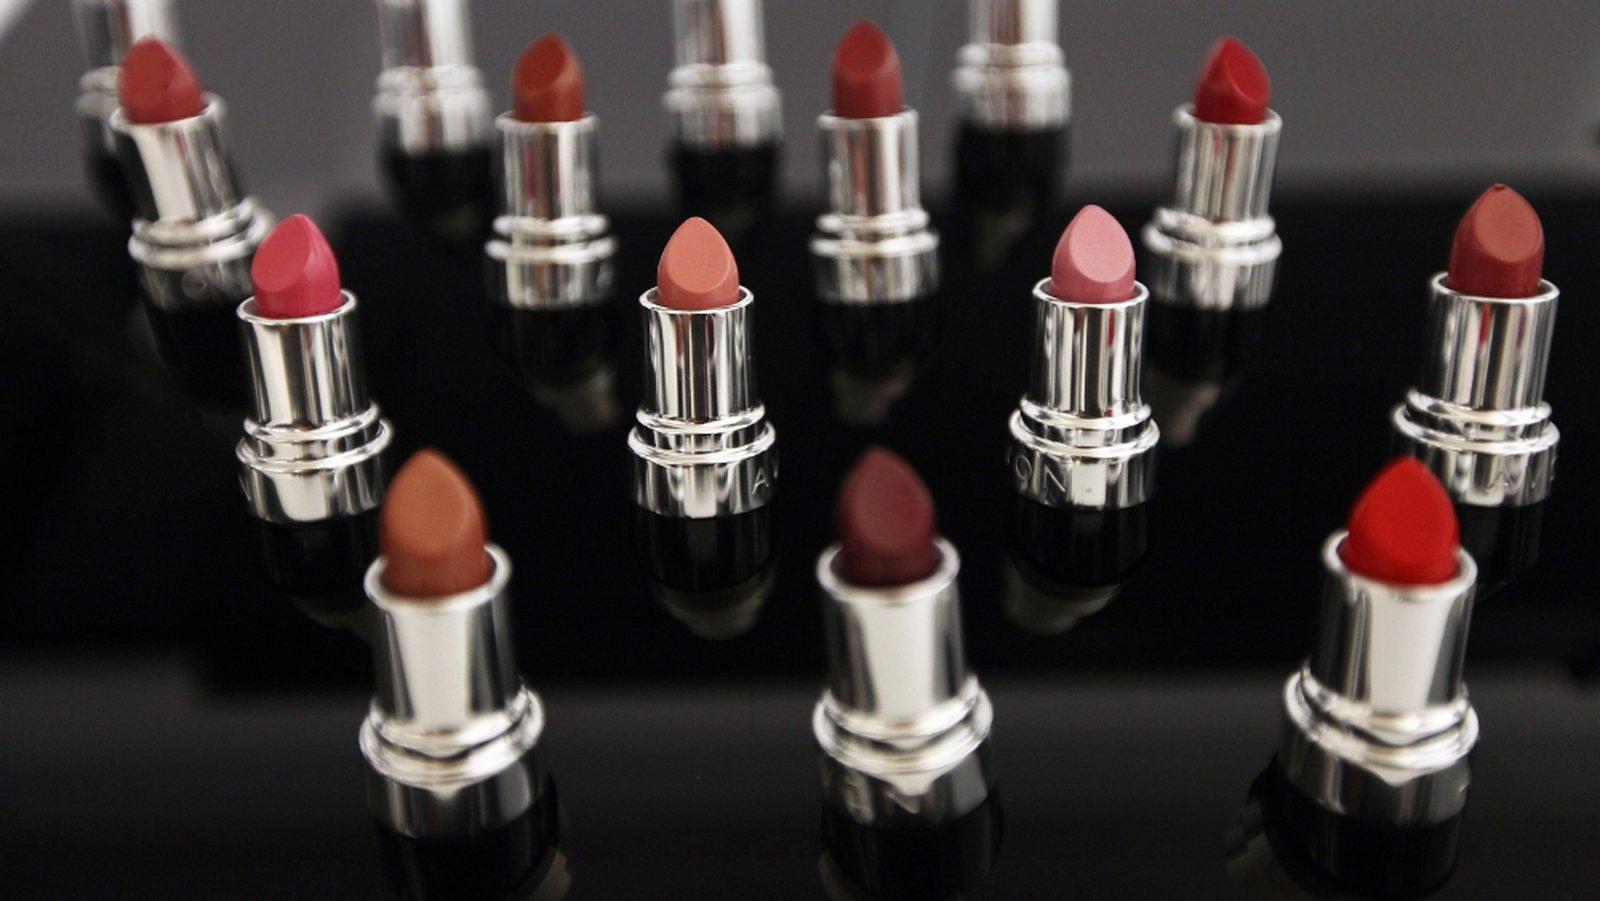 Avon Cosmetics ceases trading in Ireland